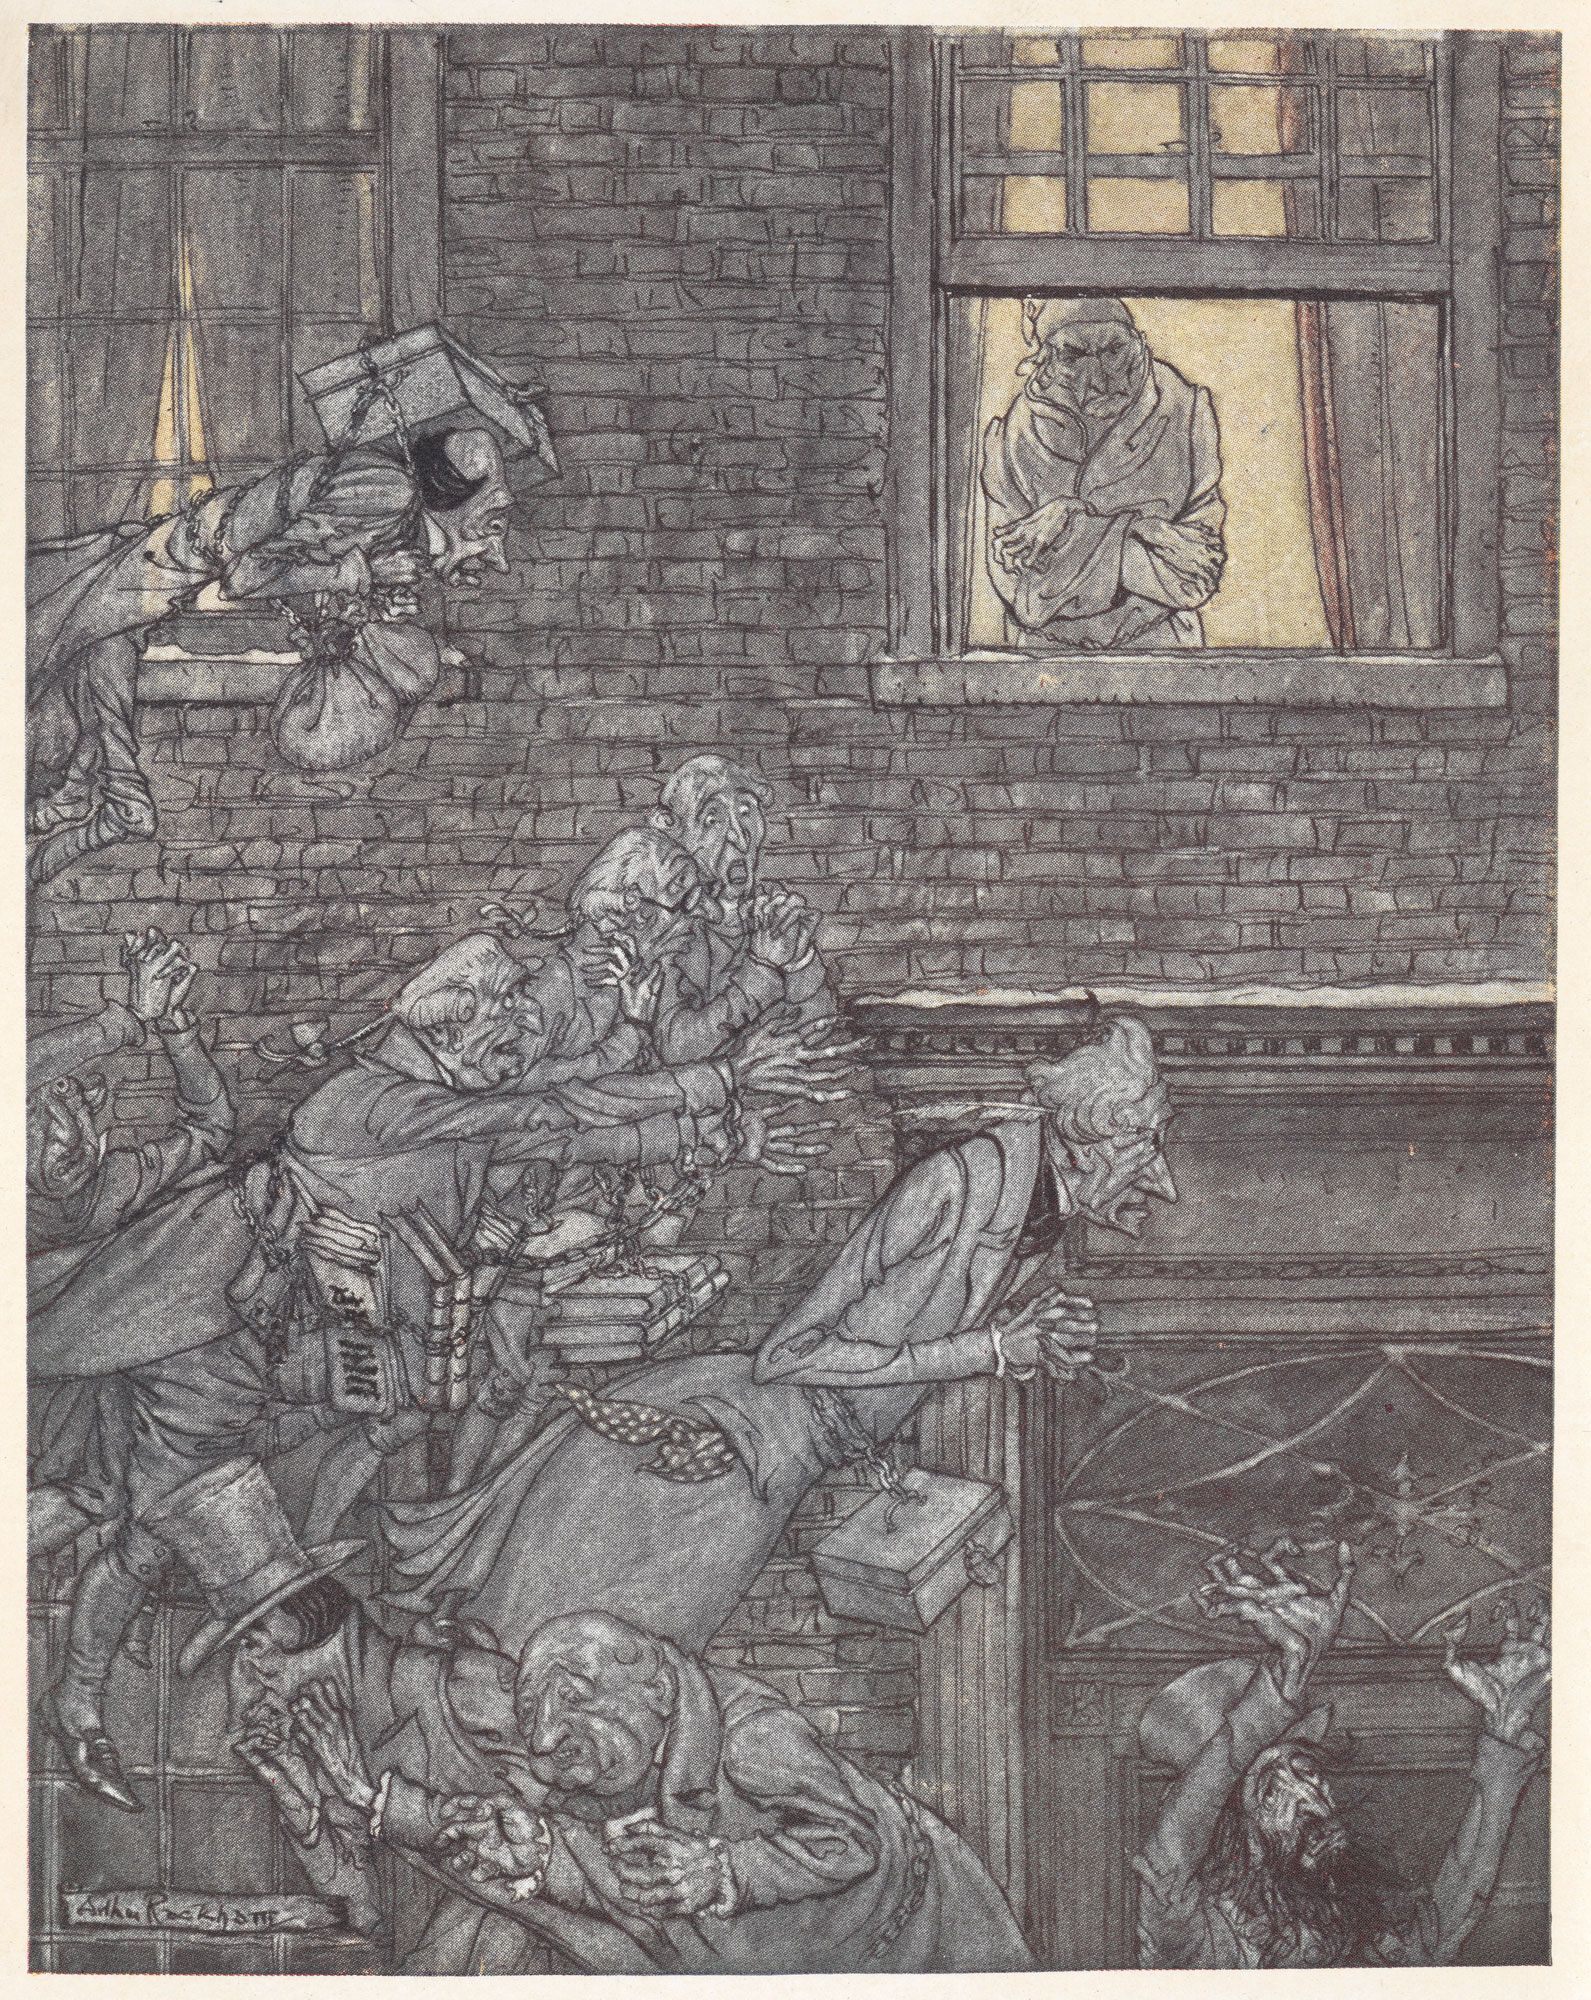 A Christmas Carol Illustrated By Arthur Rackham Christmas Carol Arthur Rackham Charles Dickens Christmas